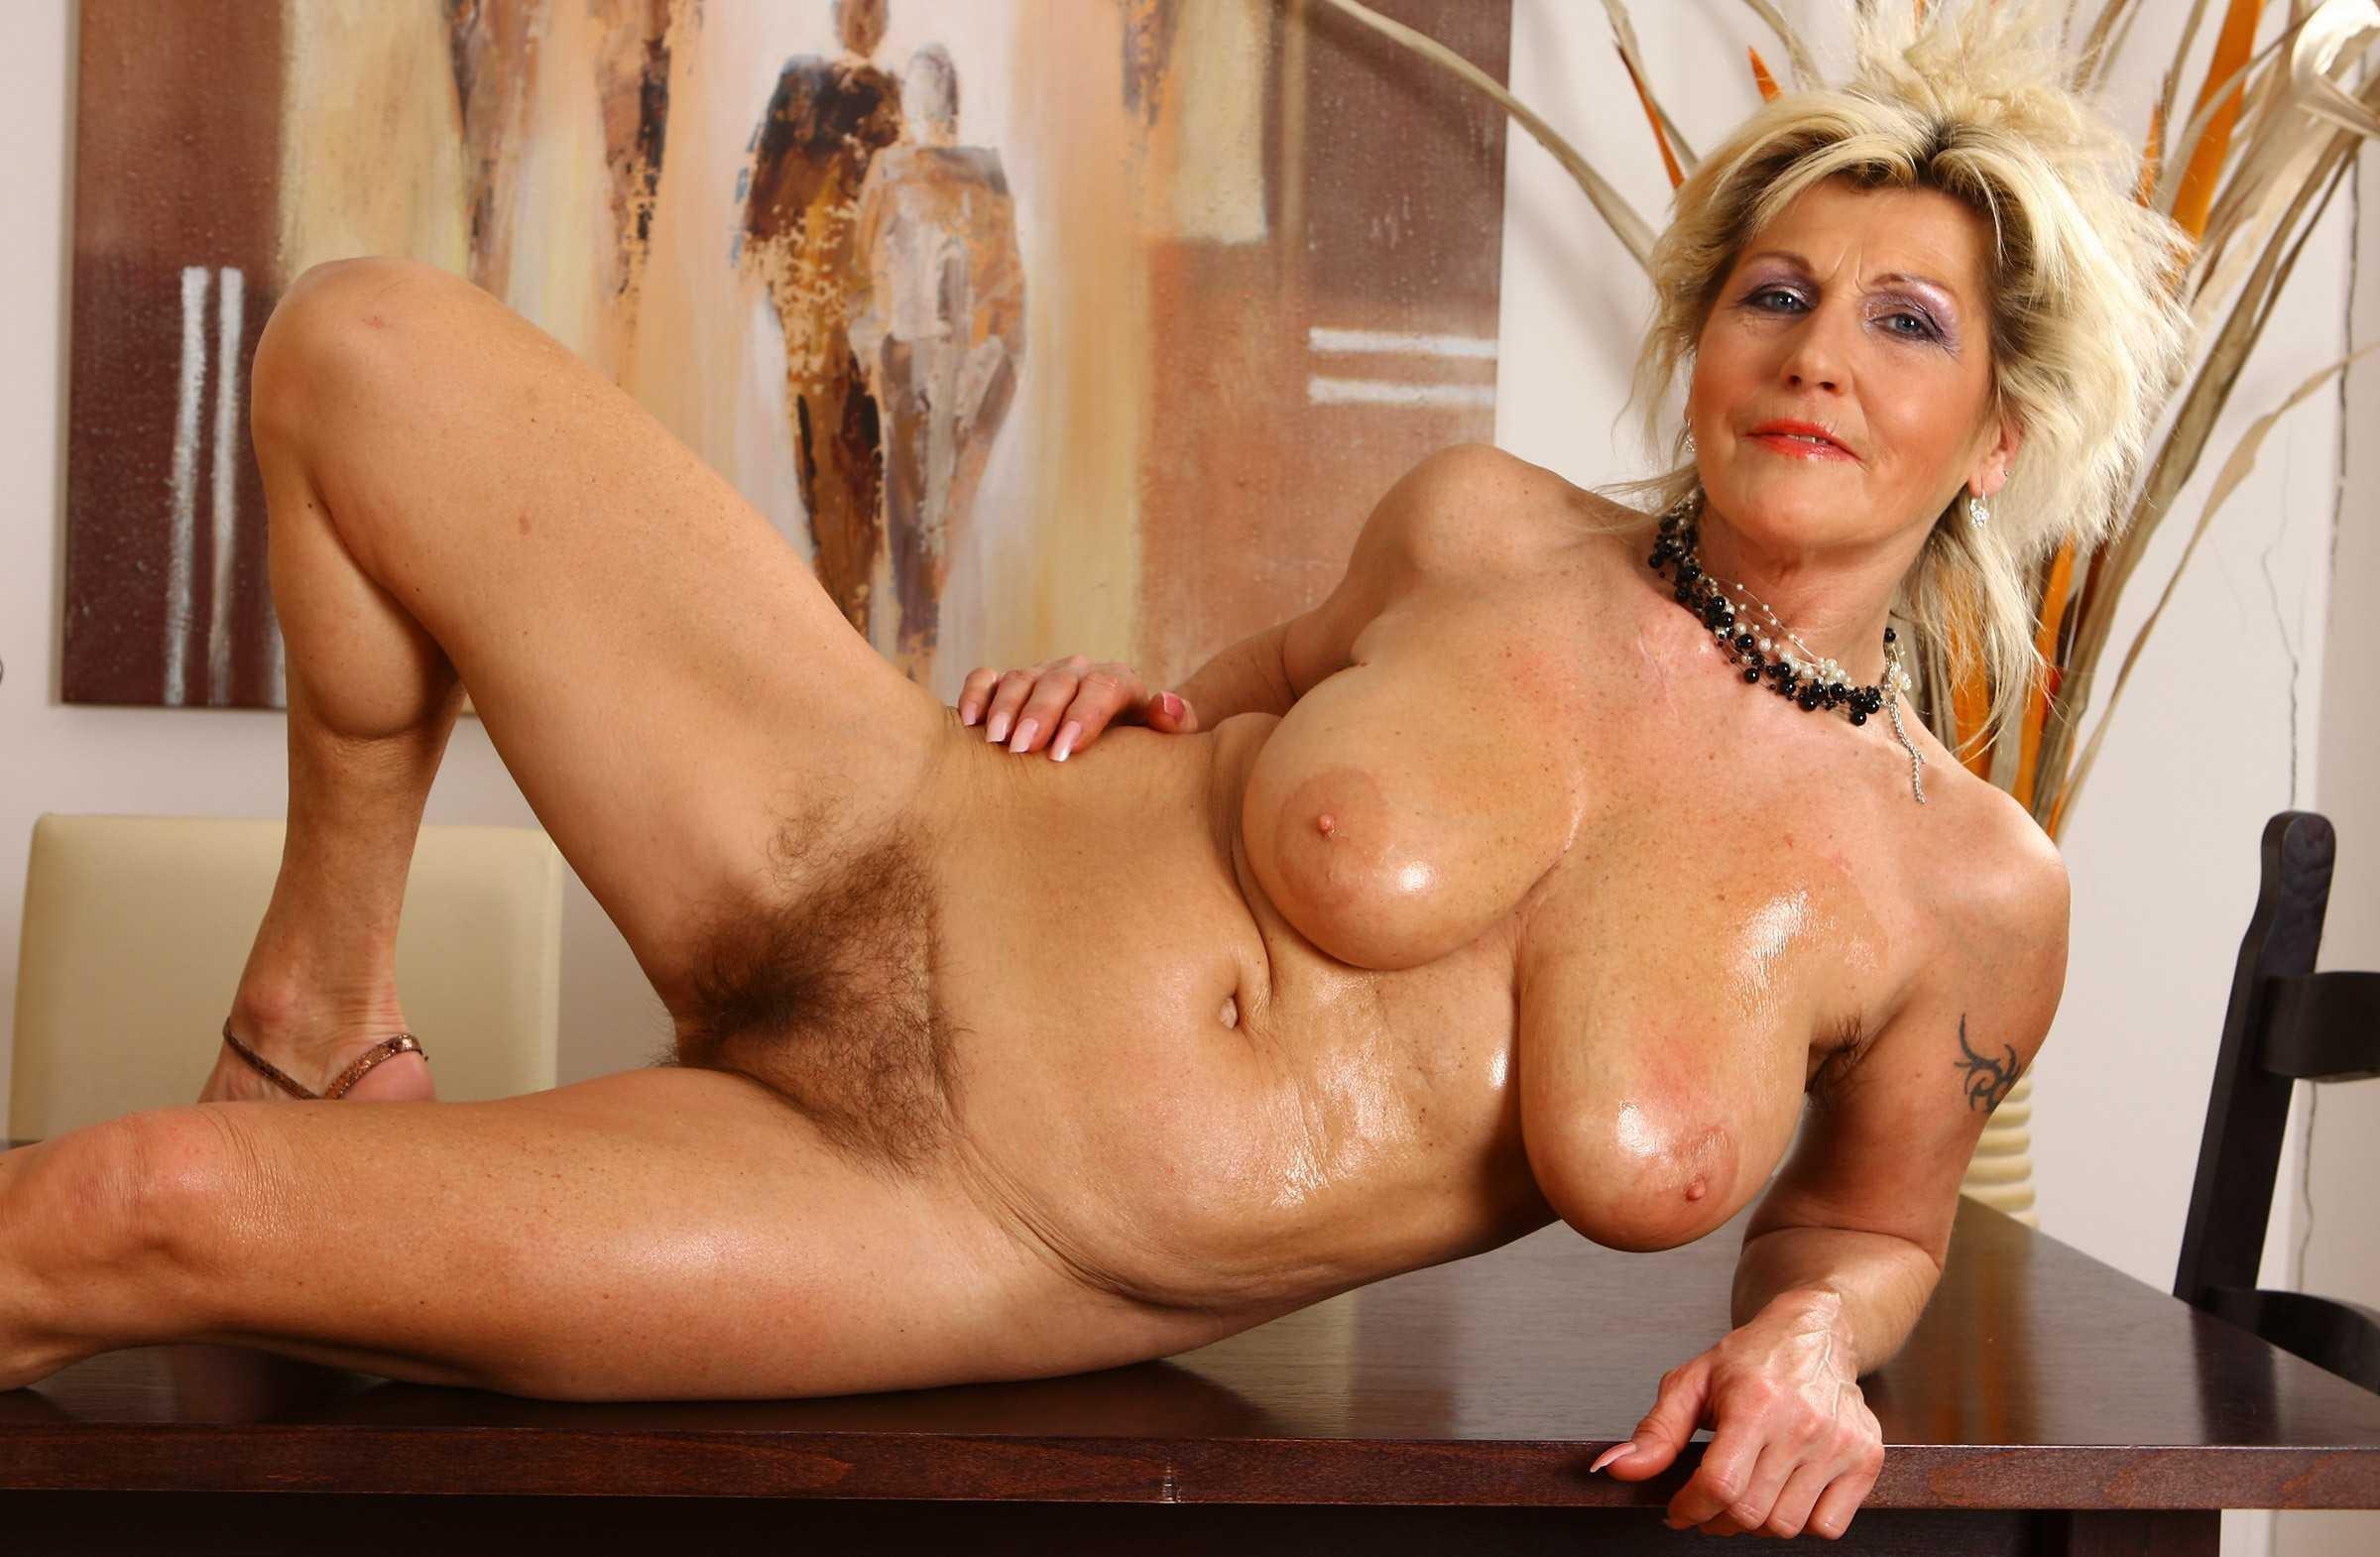 Pic sexwoman tits xxx pic